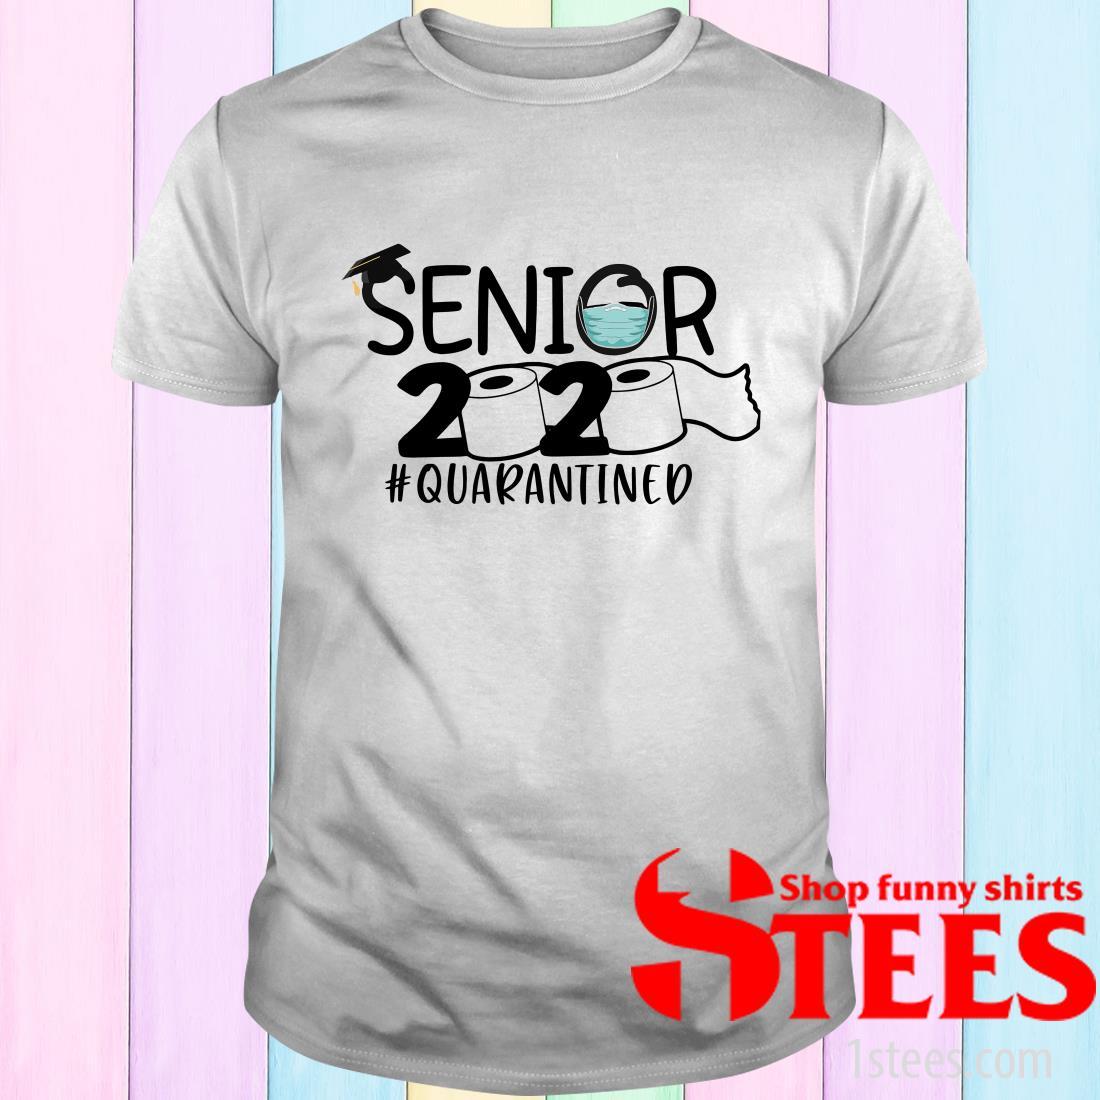 Toilet Paper Senior 2020 Quarantined T-Shirt